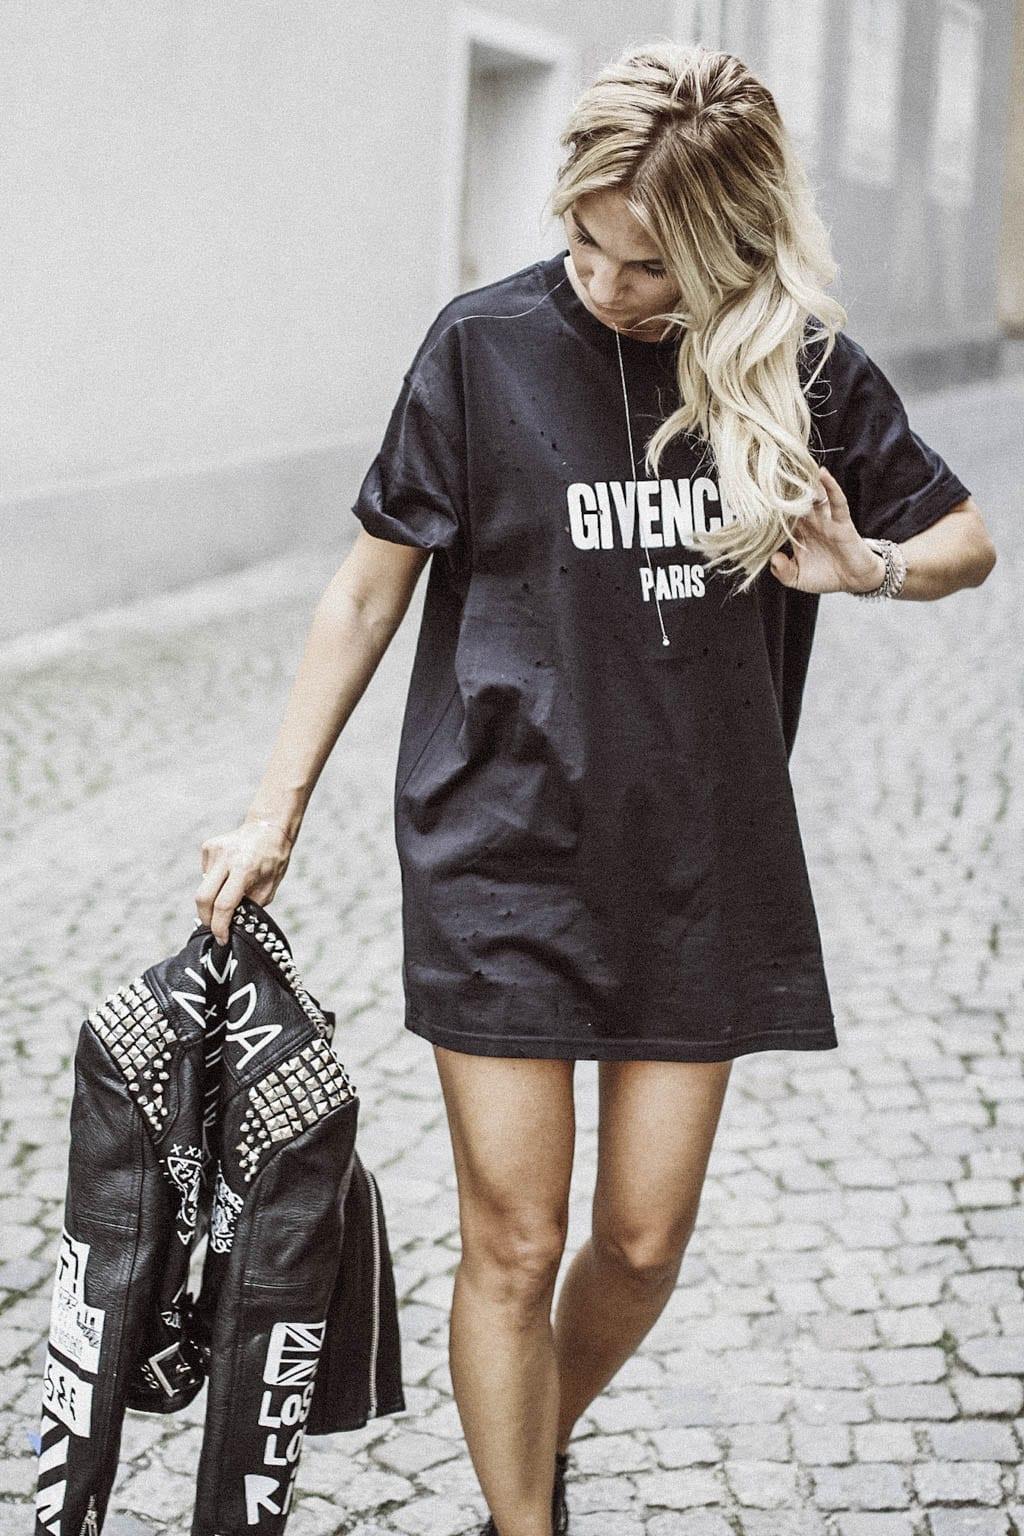 CK-Constantlly-K-Fashion-Street-Style-Blog-Rieger-Fashion-Salzburg-constantlyk.com-8865